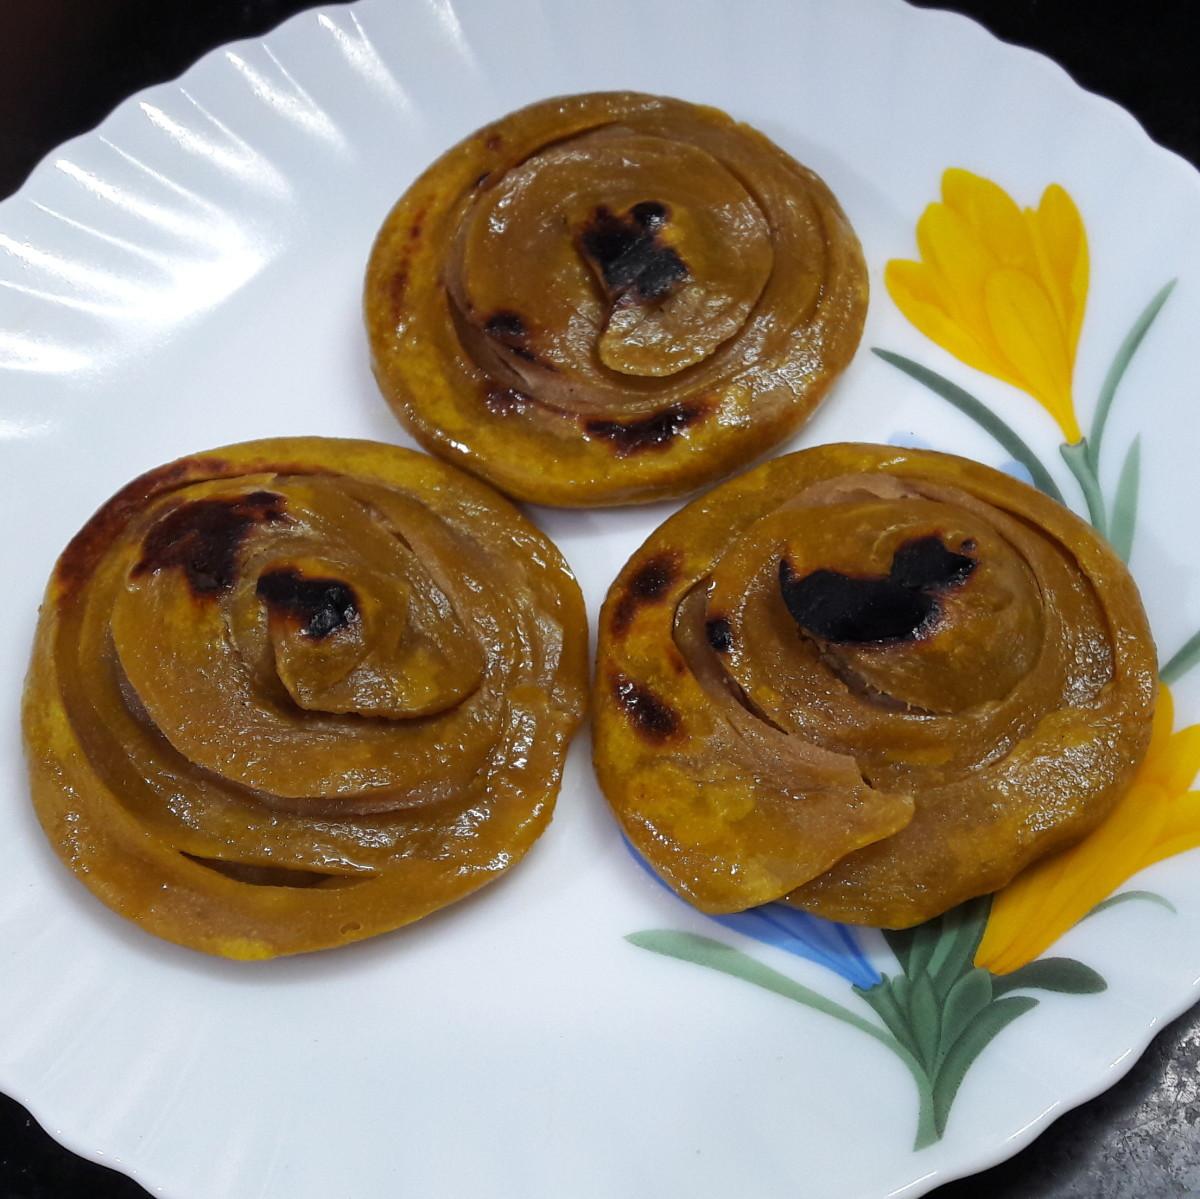 -gakhar-a-special-mughlai-bread